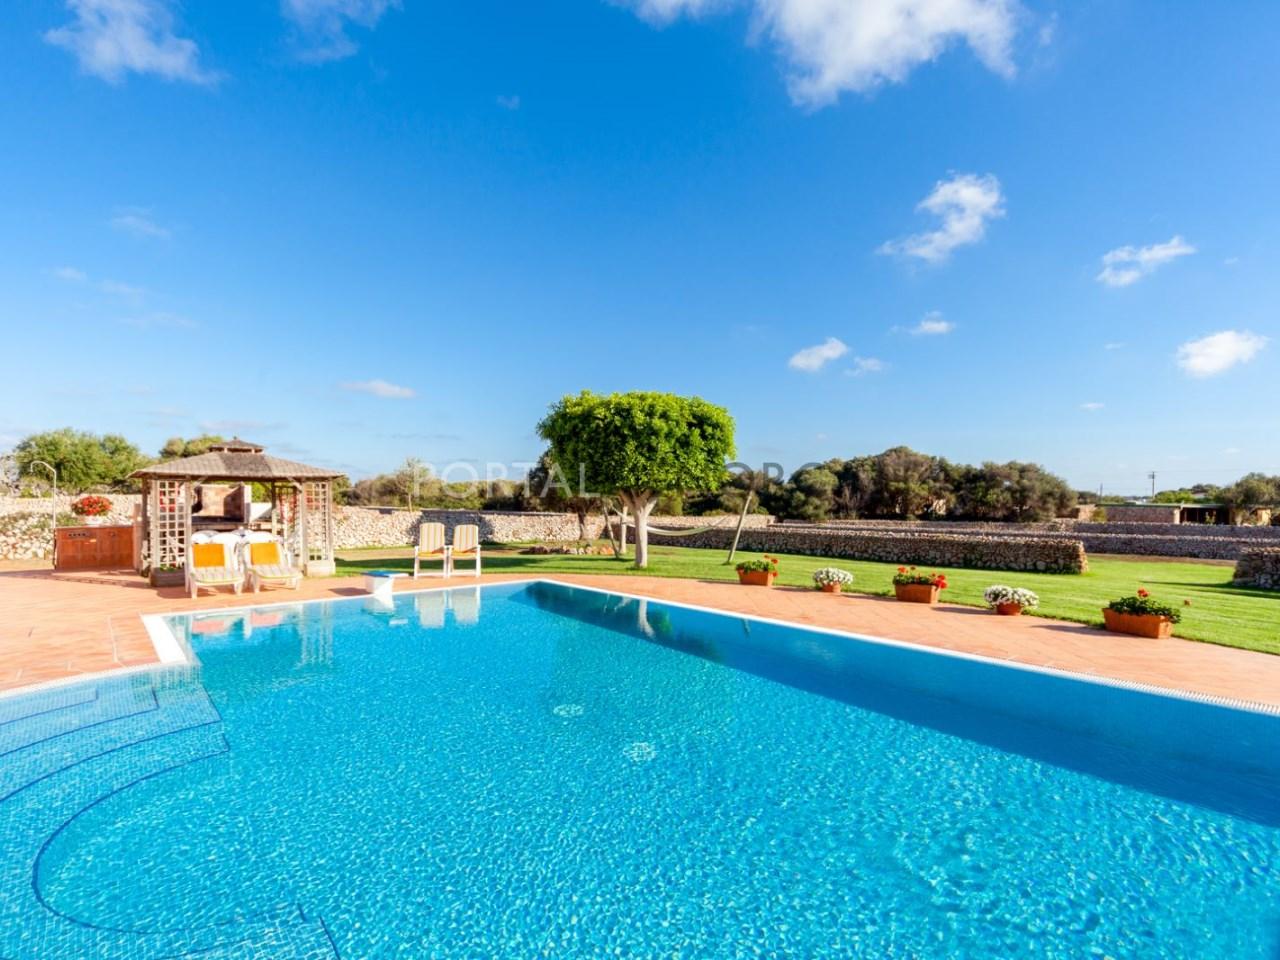 Casa de campo con piscina en Menorca (26 de 41)